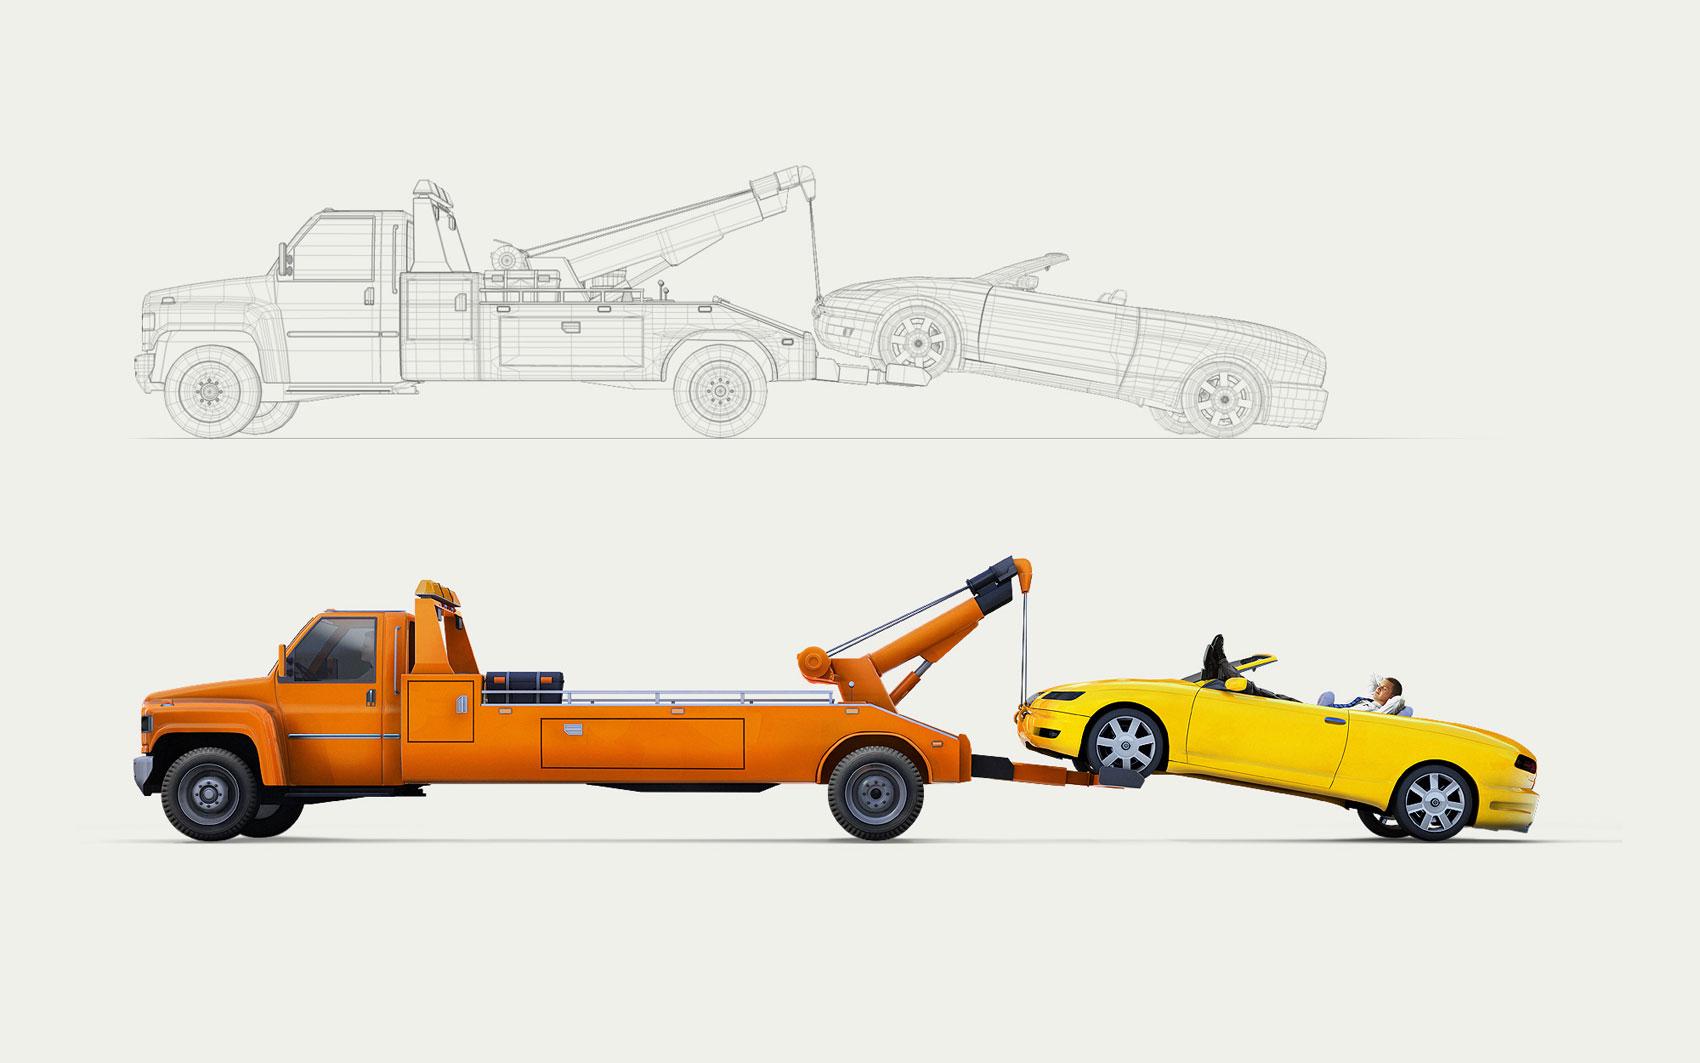 assurance-auto-1-annee-depannage-2